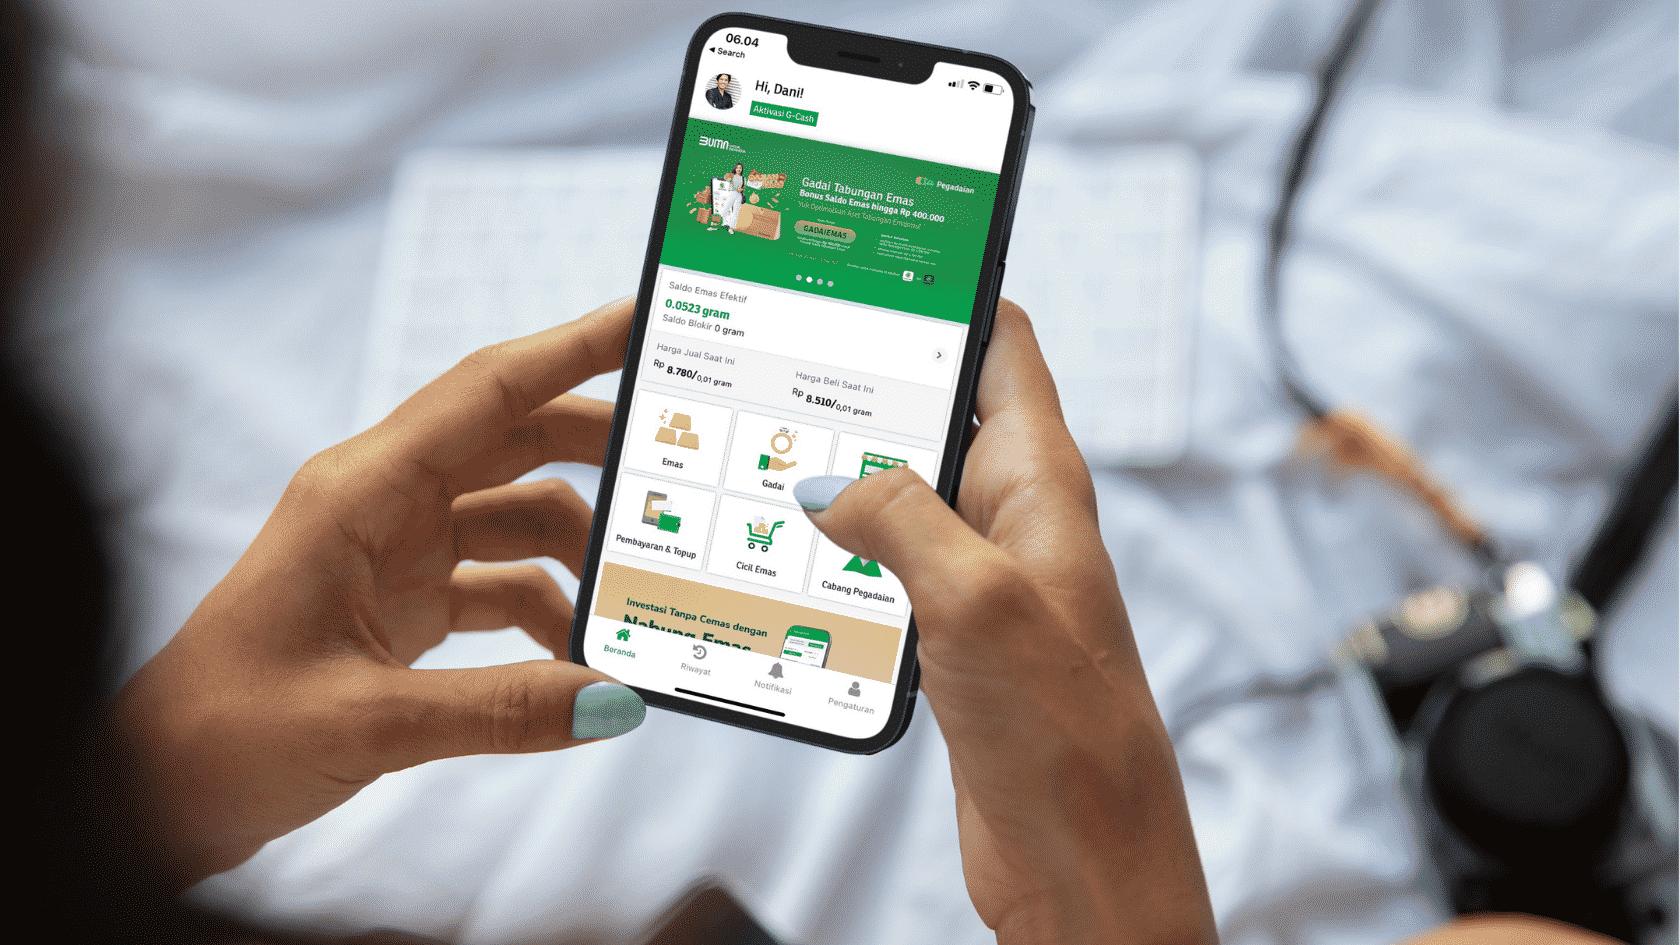 Investasi emas online di Pegadaian